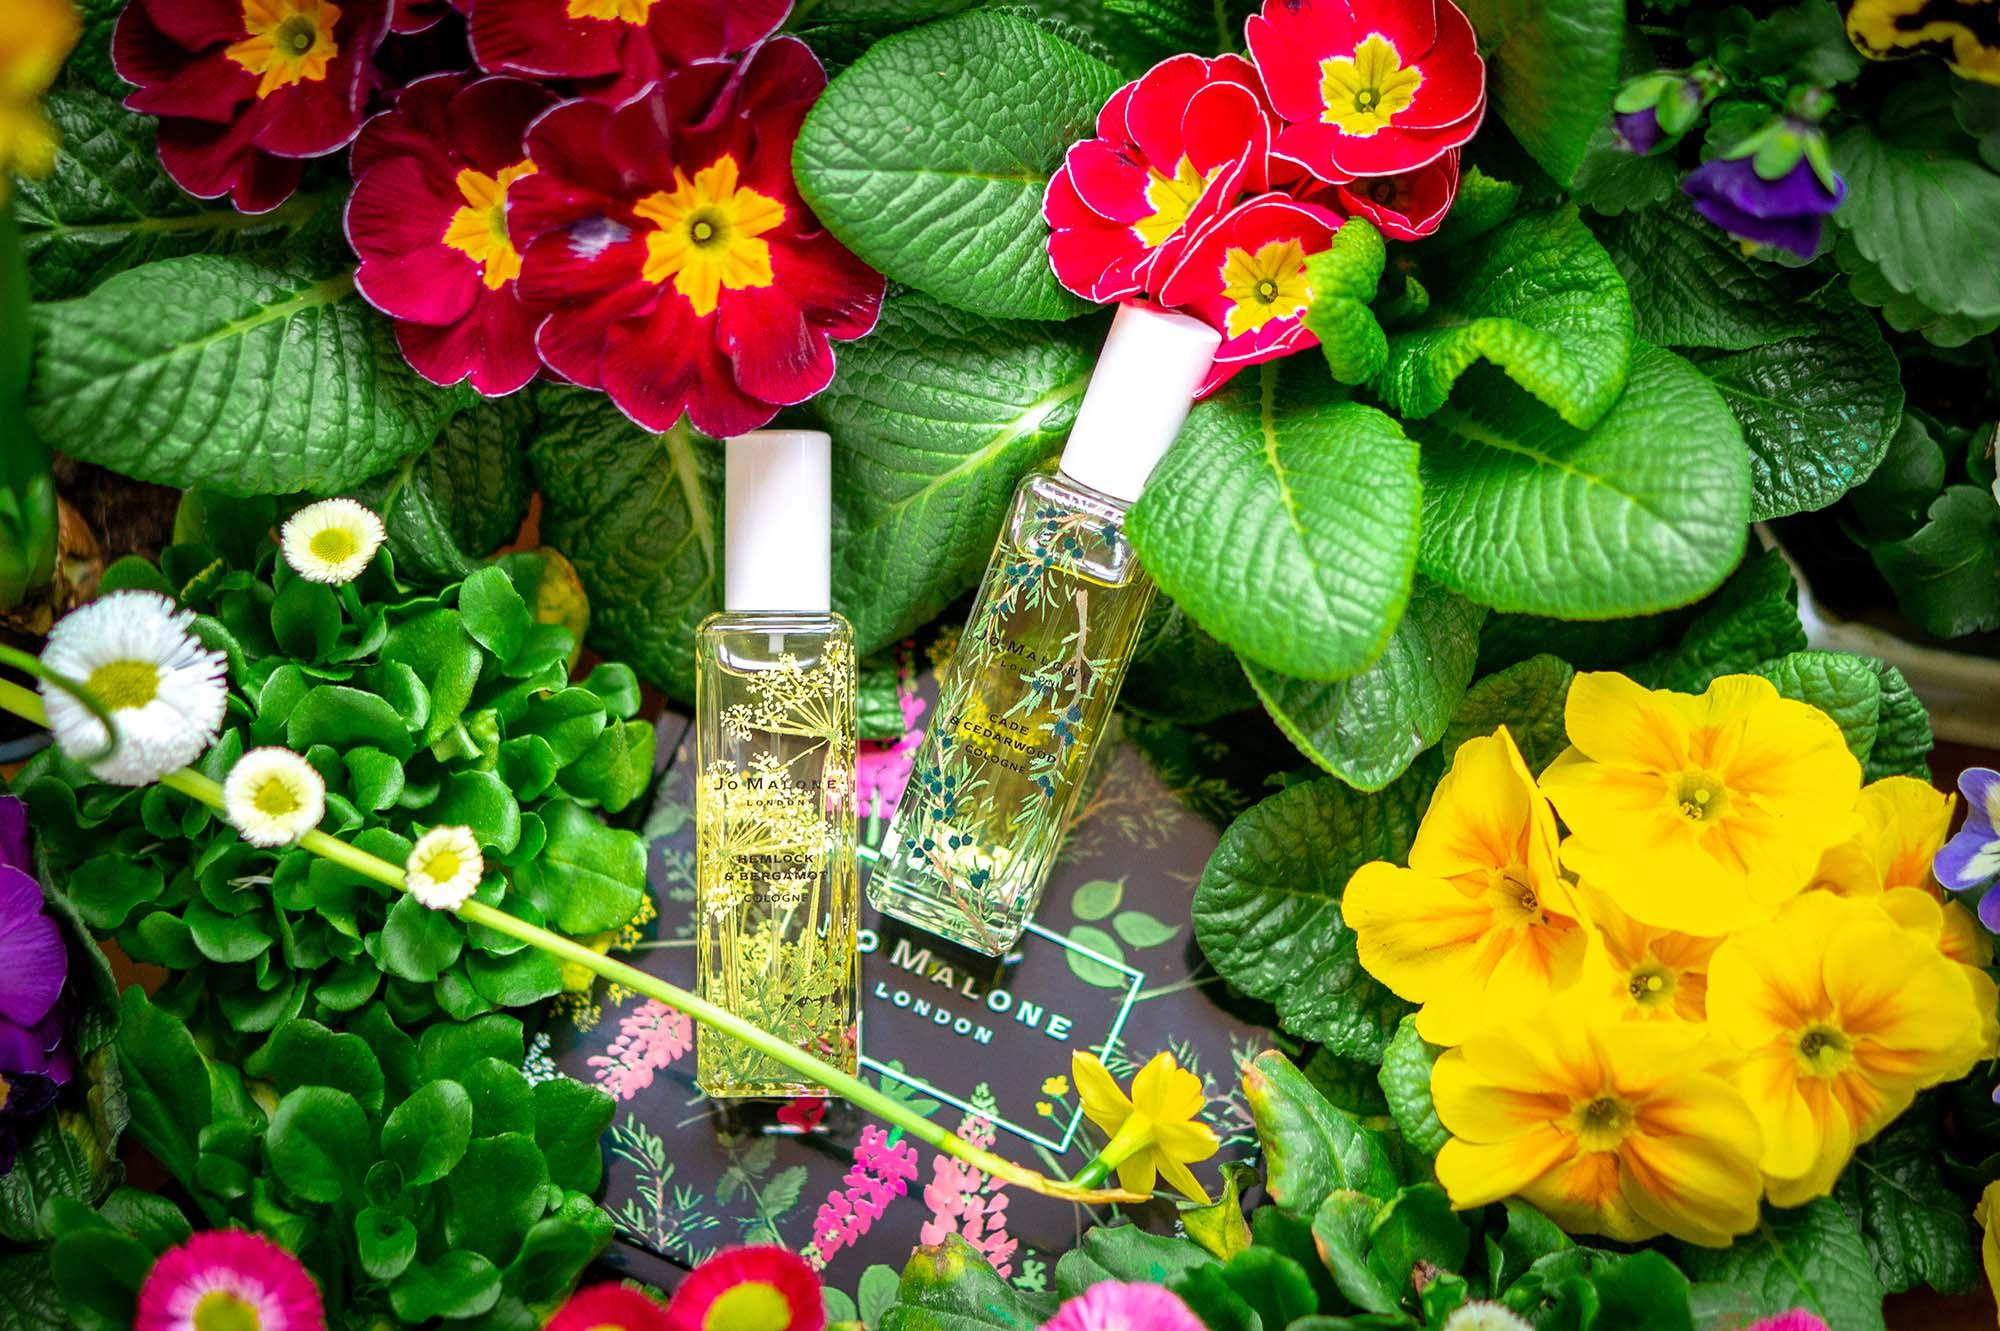 Полный обзор парфюмерной коллекции Wild Flowers & Weeds Jo Malone London